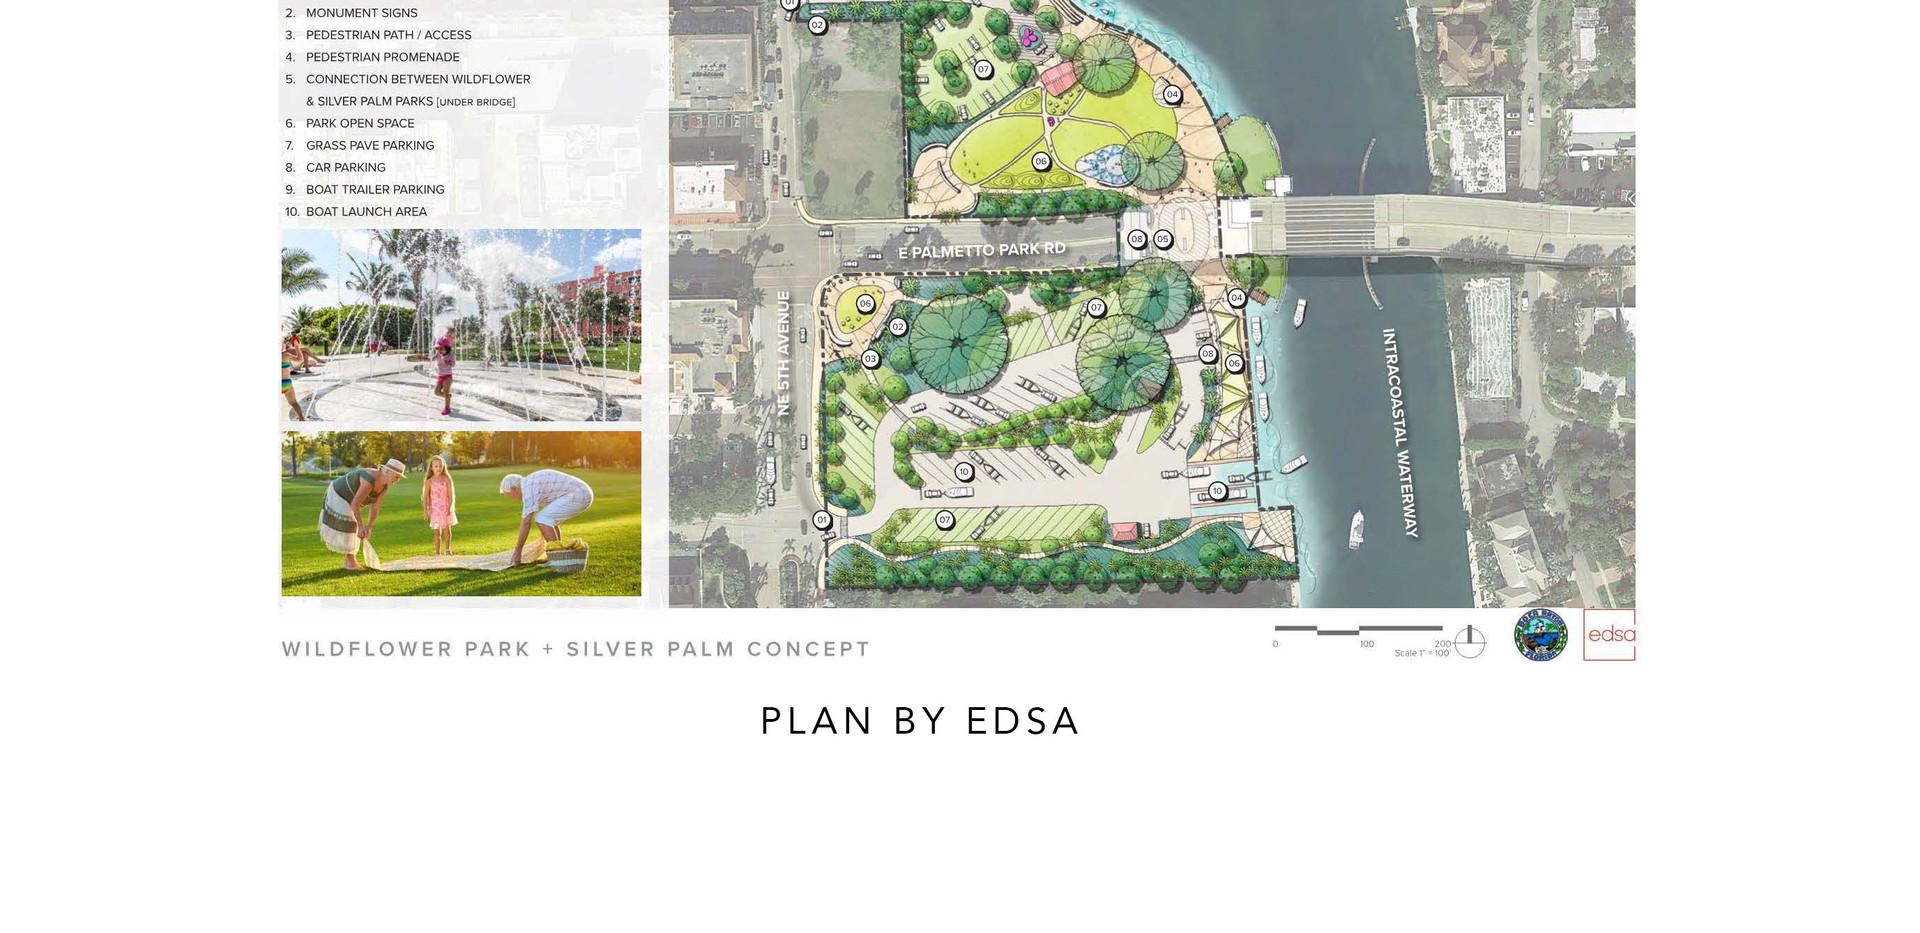 6_EDSA Park crop copy.jpg